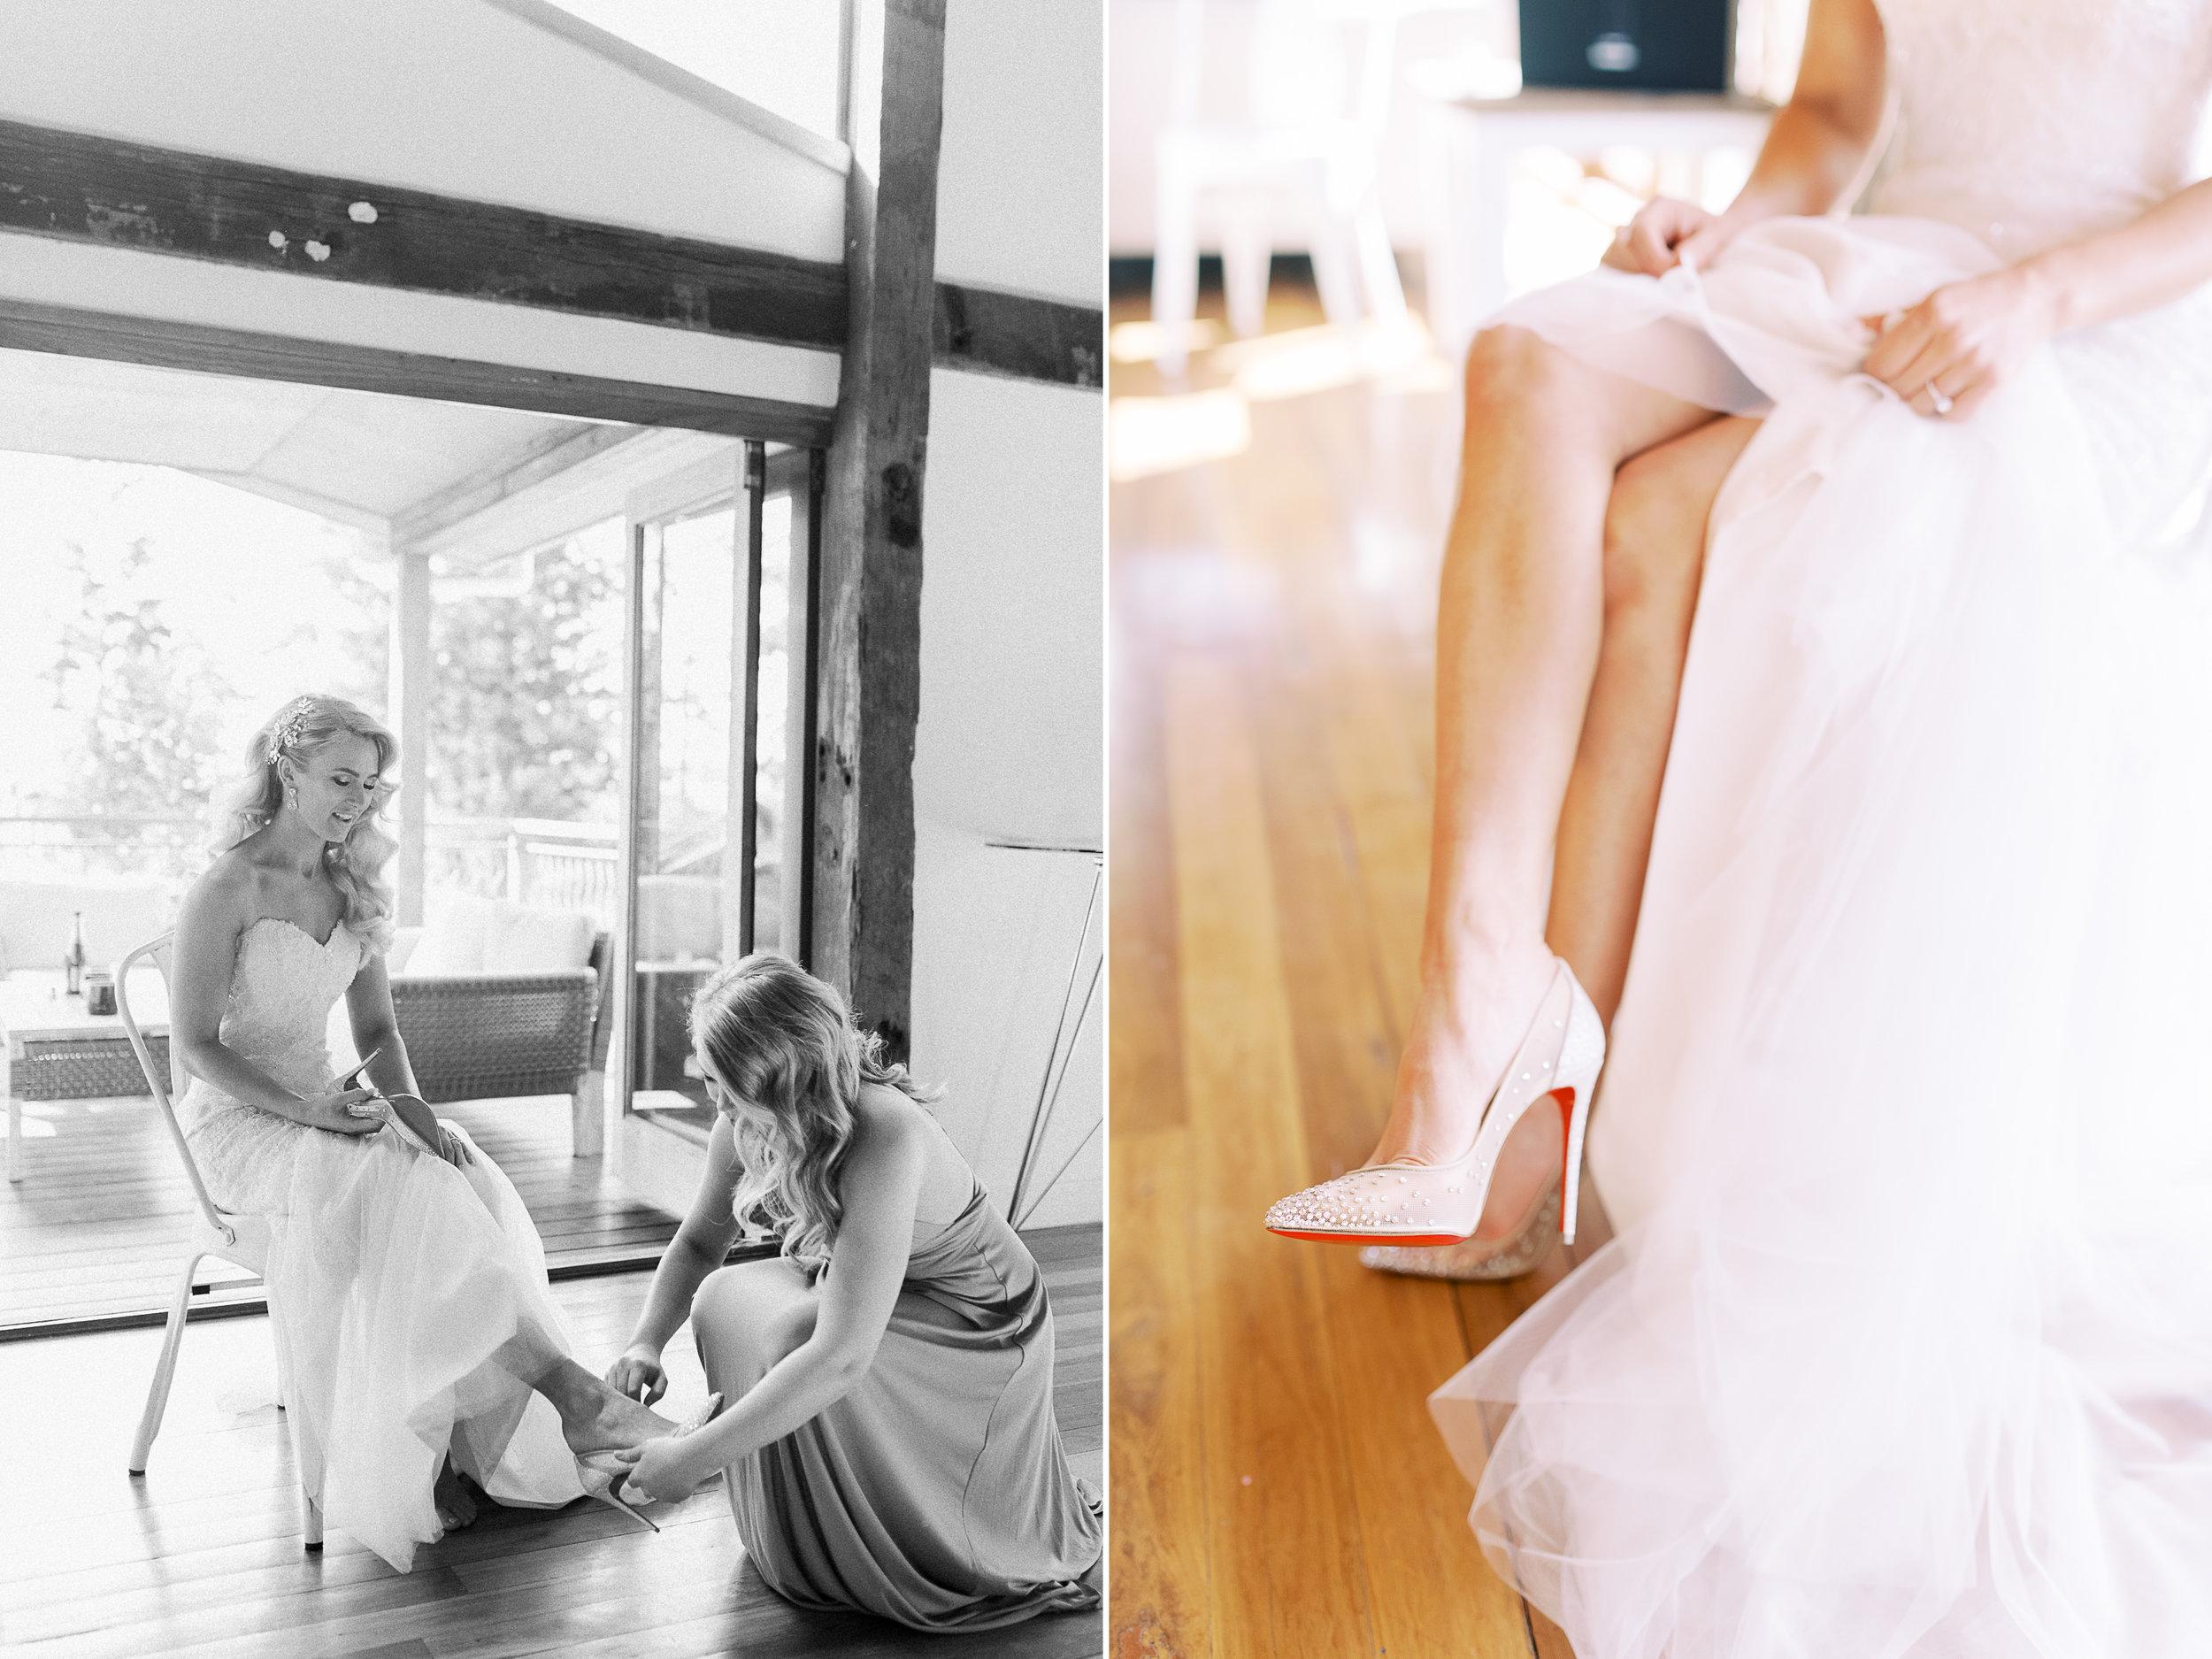 kooroomba-lavendar-farm-film-photography-wedding-photography-romantic-06.jpg